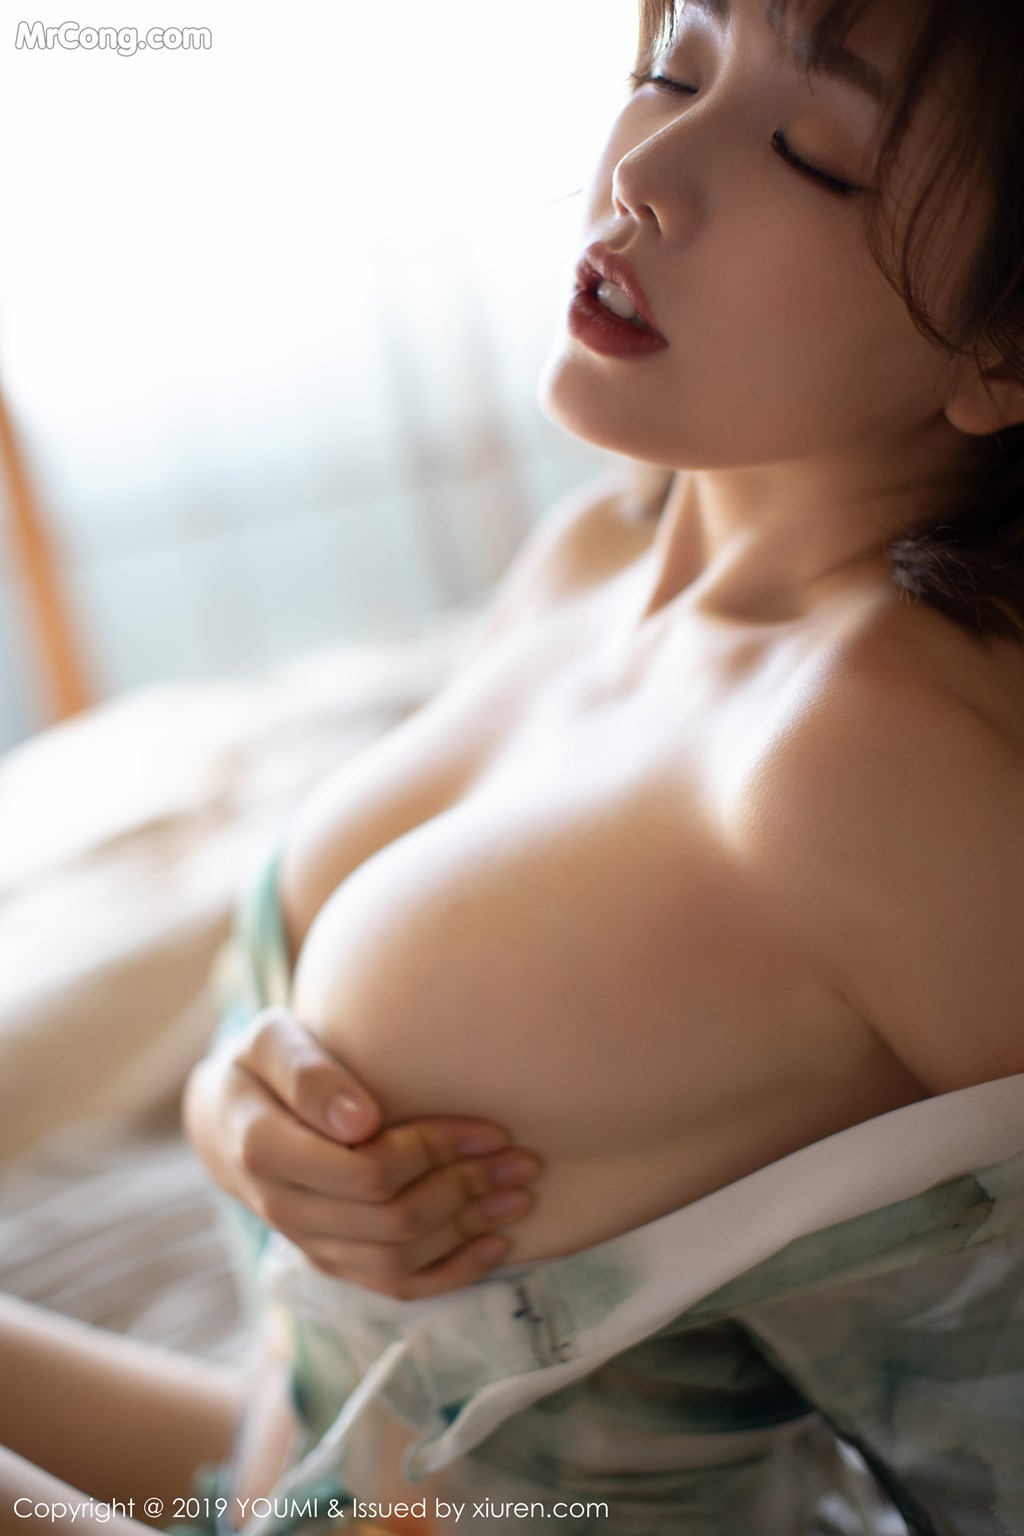 Image YouMi-Vol.267-Huang-Le-Ran-MrCong.com-031 in post YouMi Vol.267: Người mẫu Huang Le Ran (黄楽然) (65 ảnh)